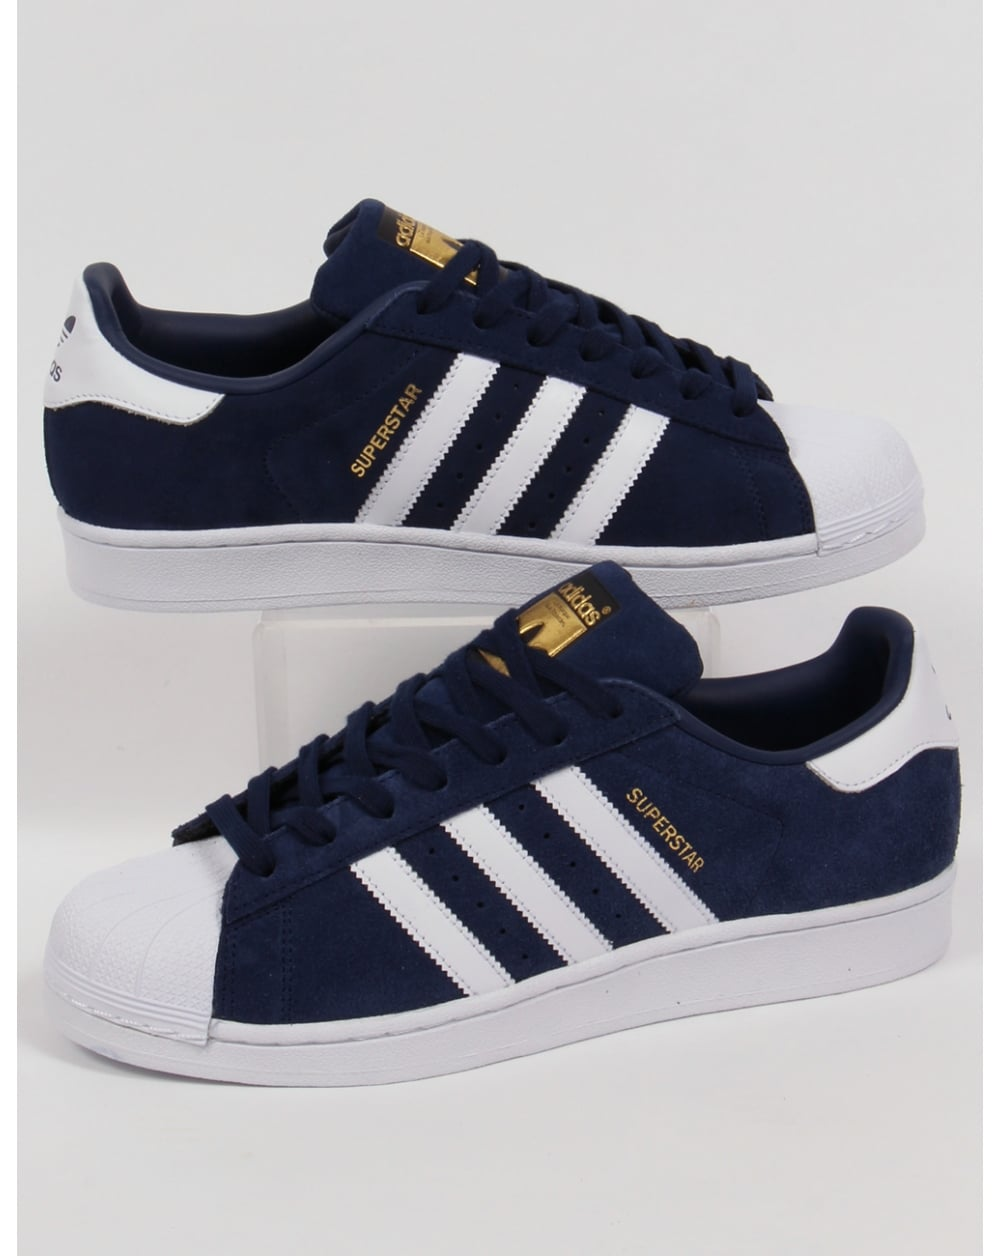 Adidas Superstar màu classic blue